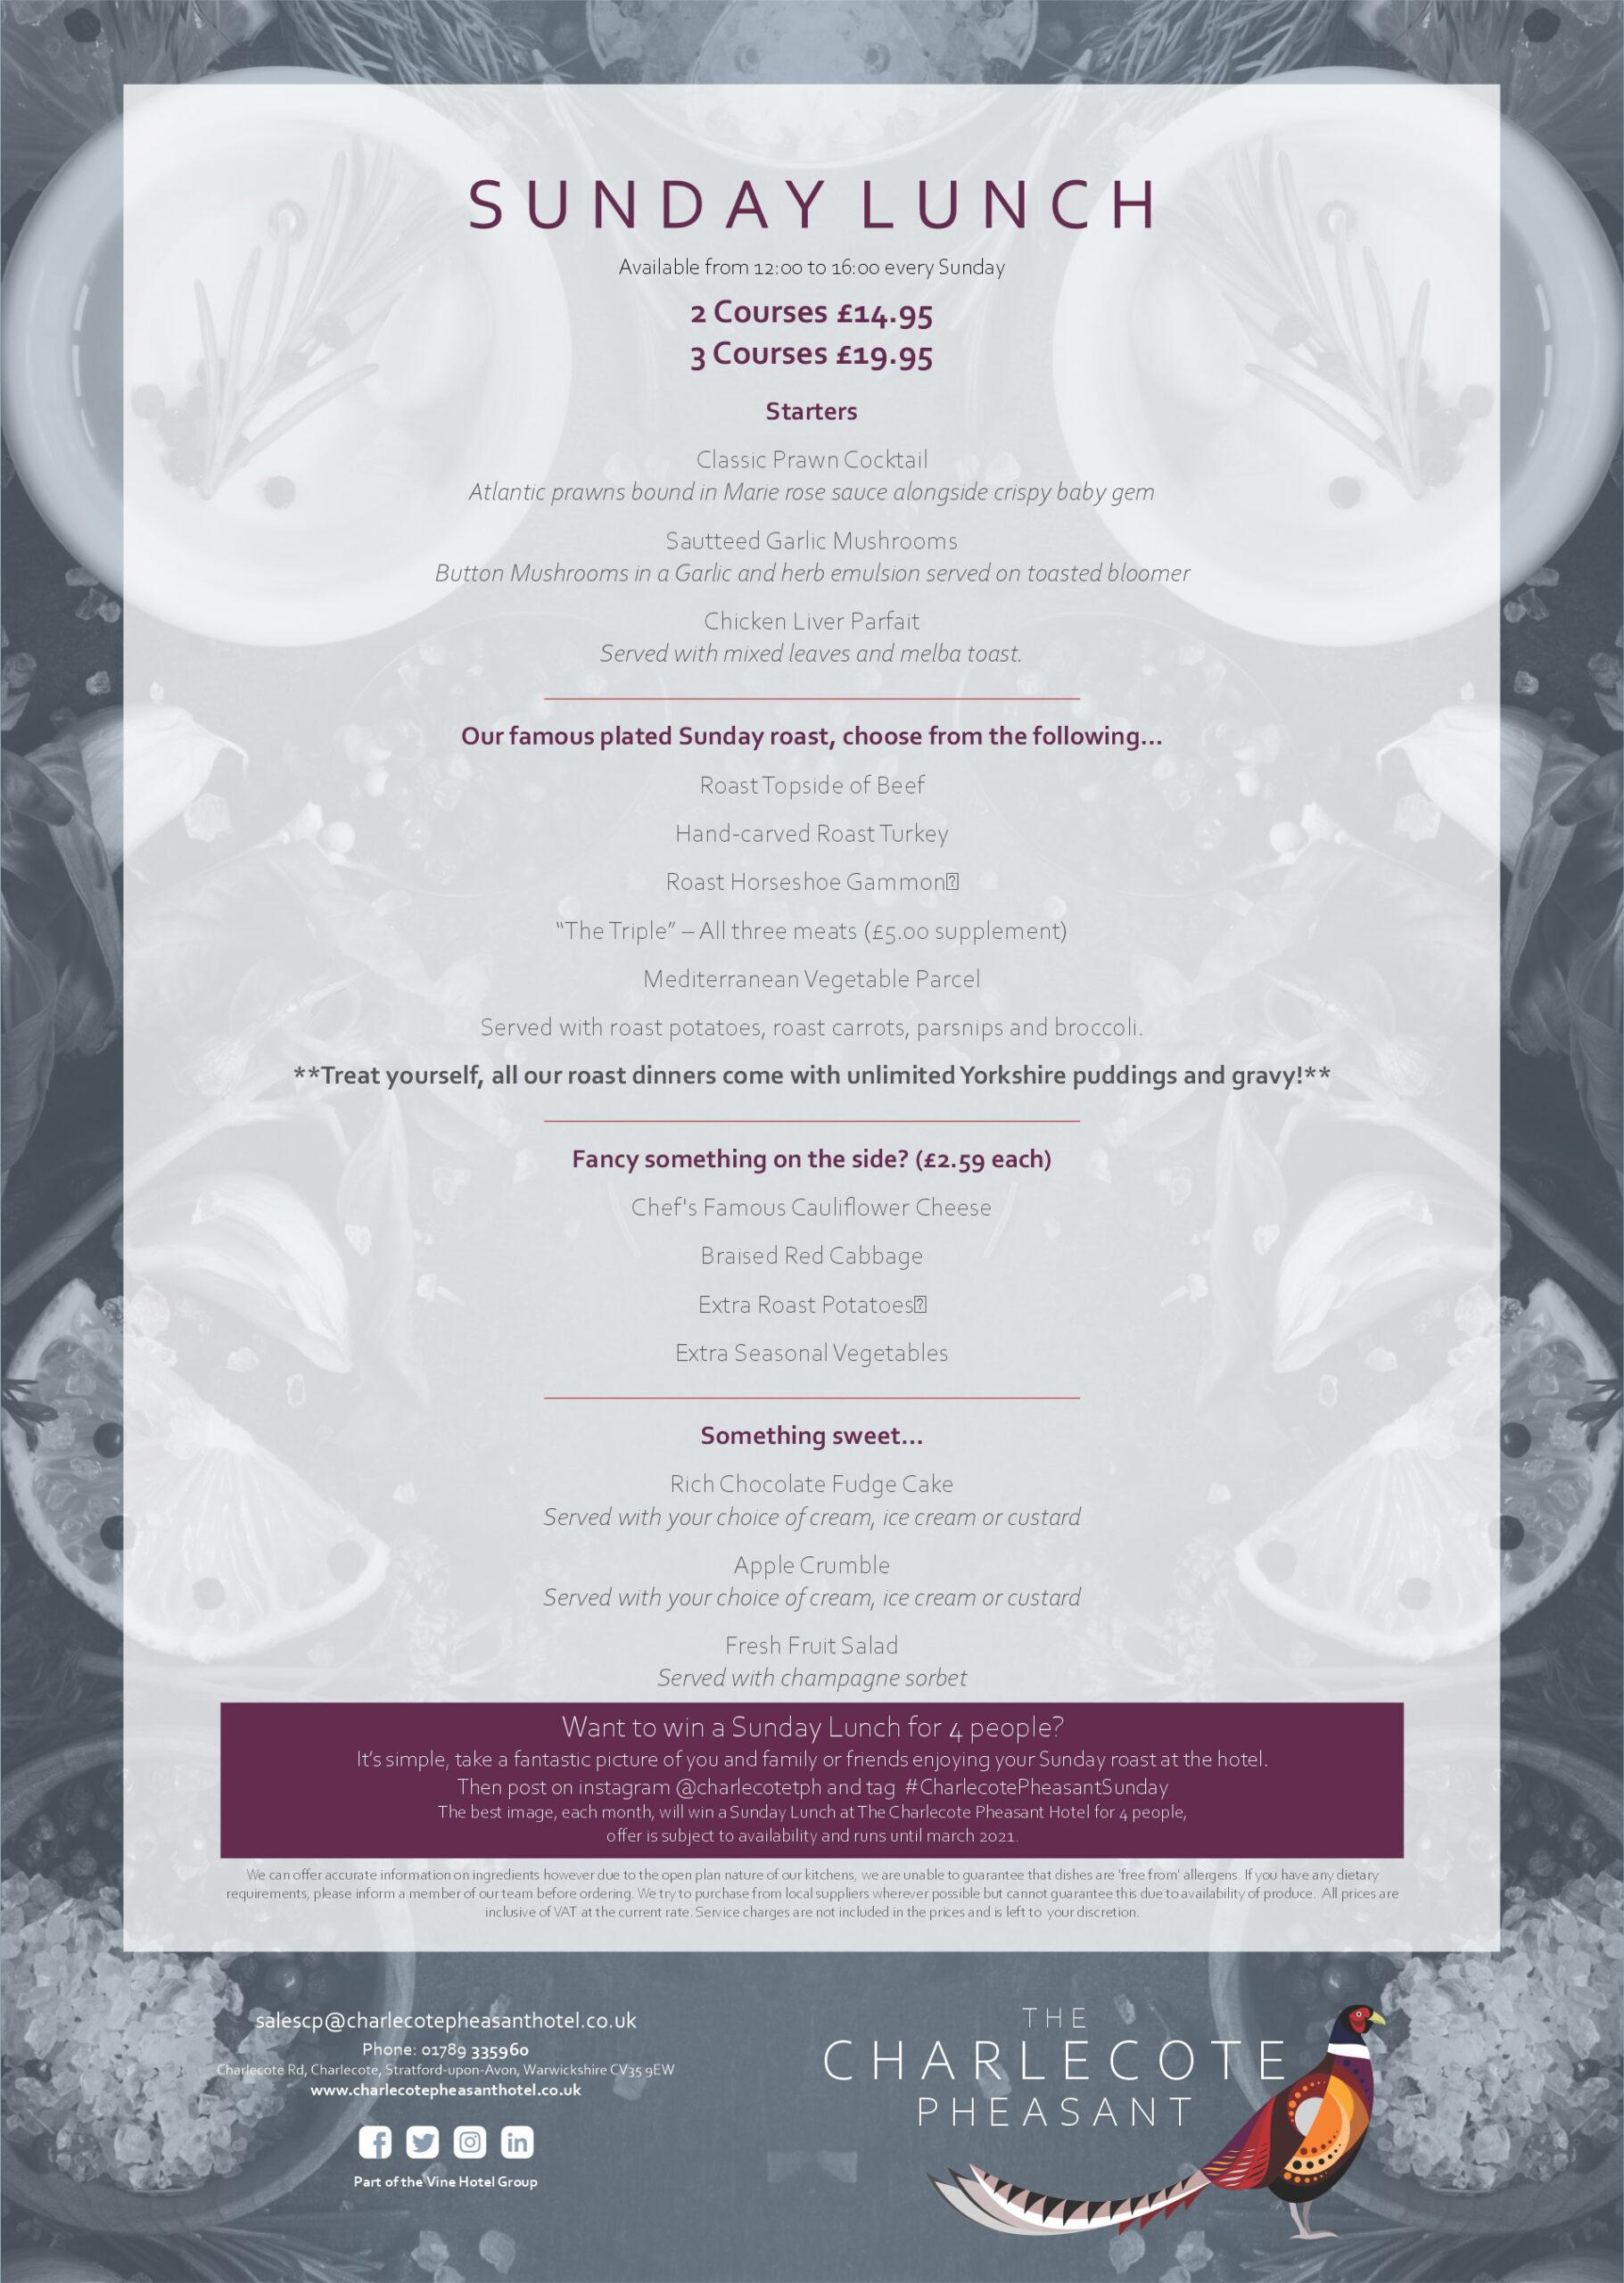 The Charlecote Pheasant Hotel Sunday Lunch Menu